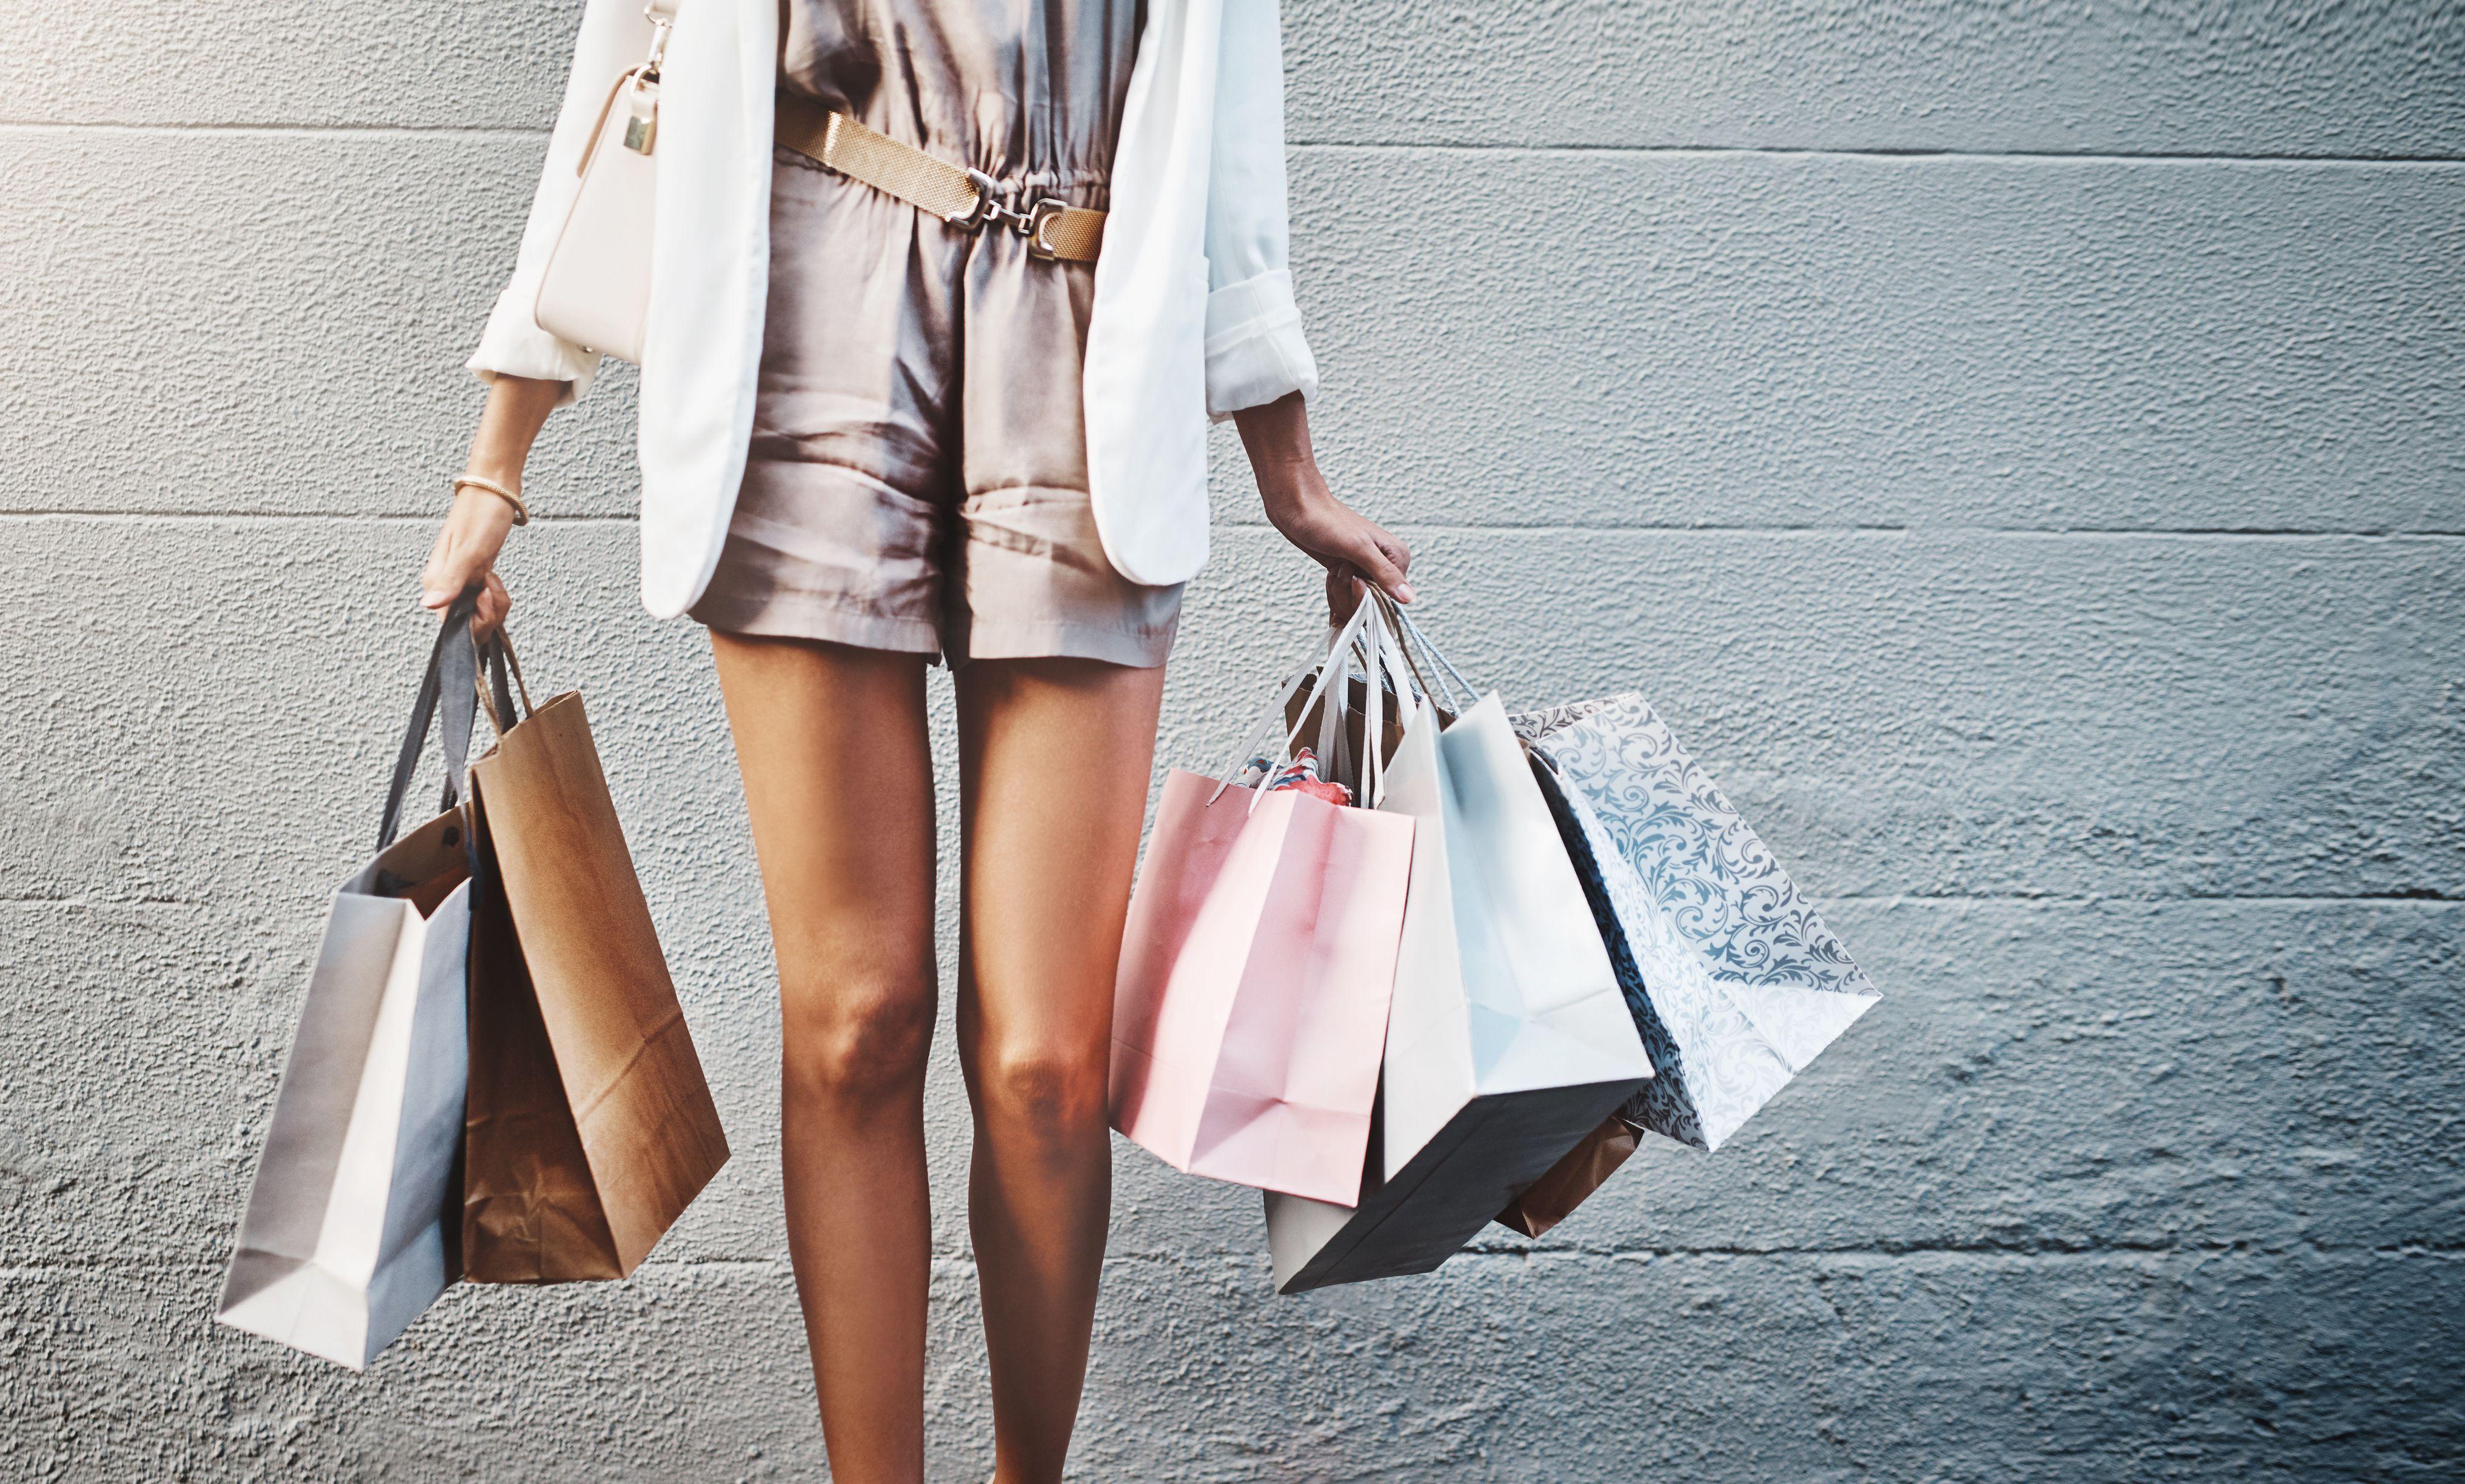 Piccoli Stivali E Sopra Lei skinny jeans archivi | befashionblog